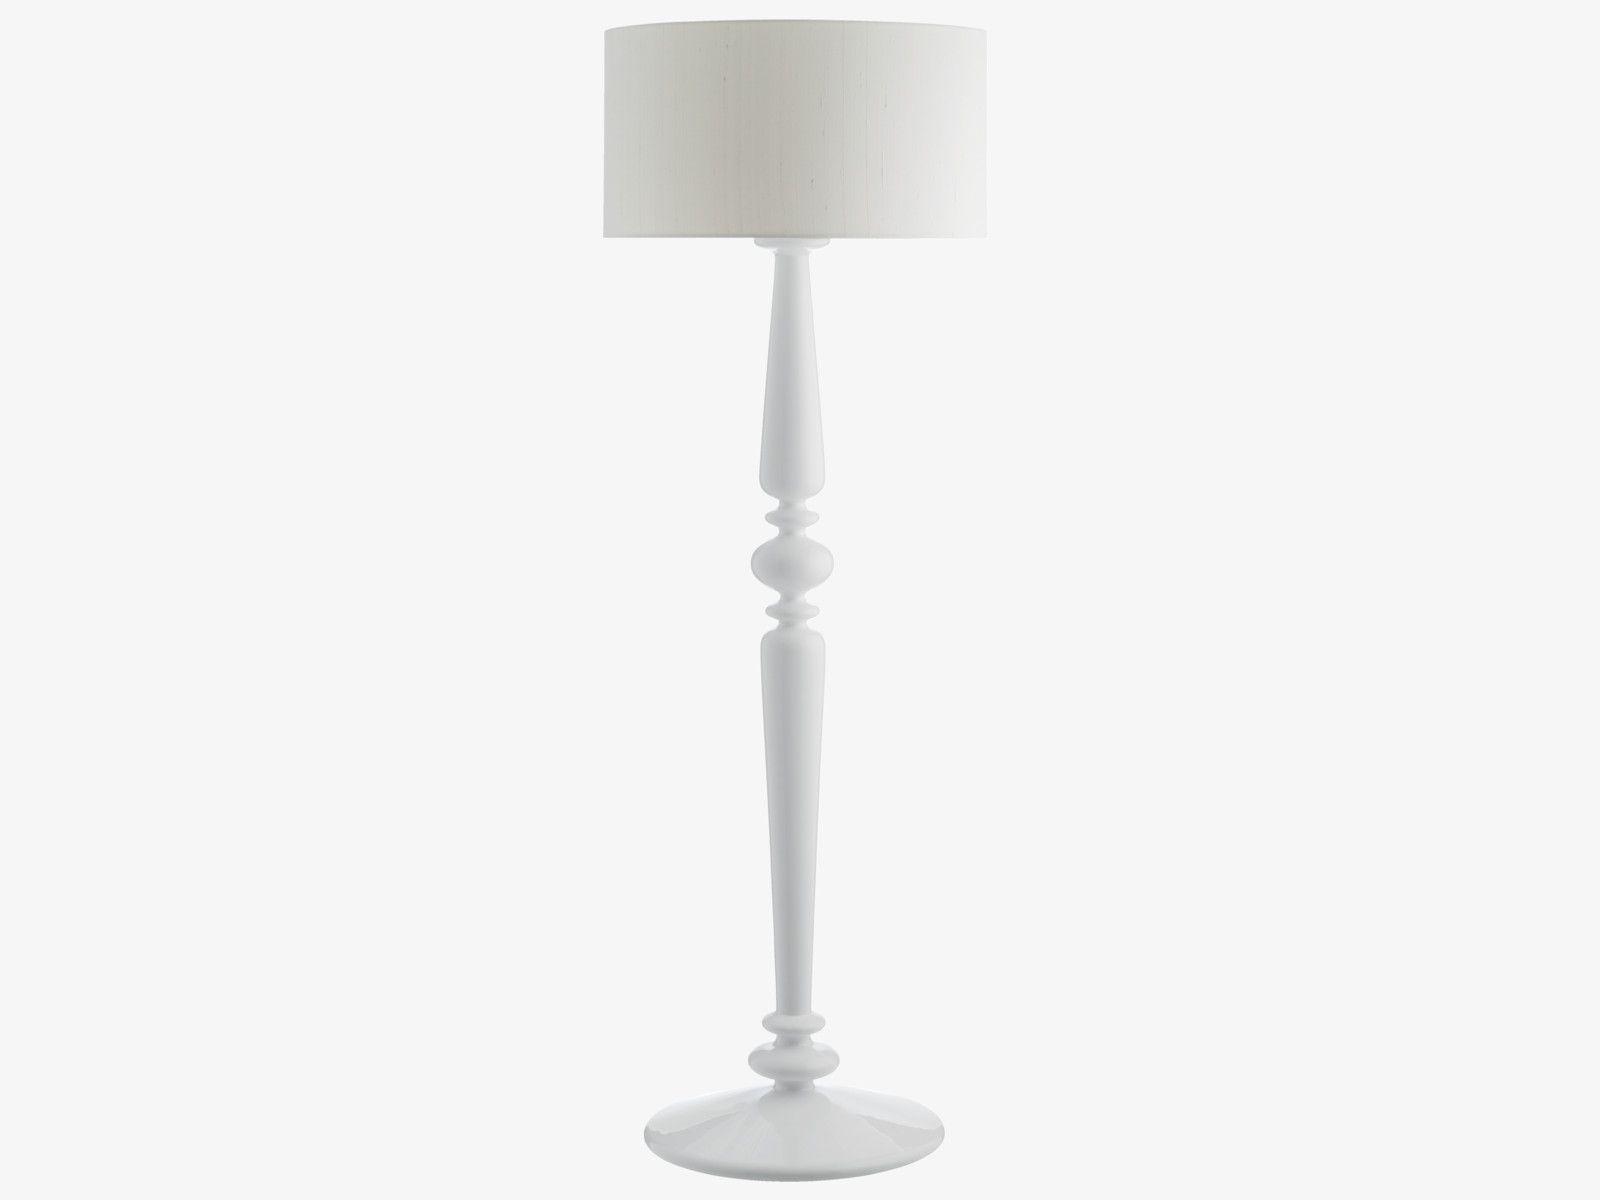 Spindle Whites Fibreglass White High Gloss Lacquered Floor Lamp Base Habitatuk Dining Room Colour Schemes Floor Lamp Base Dining Room Colors